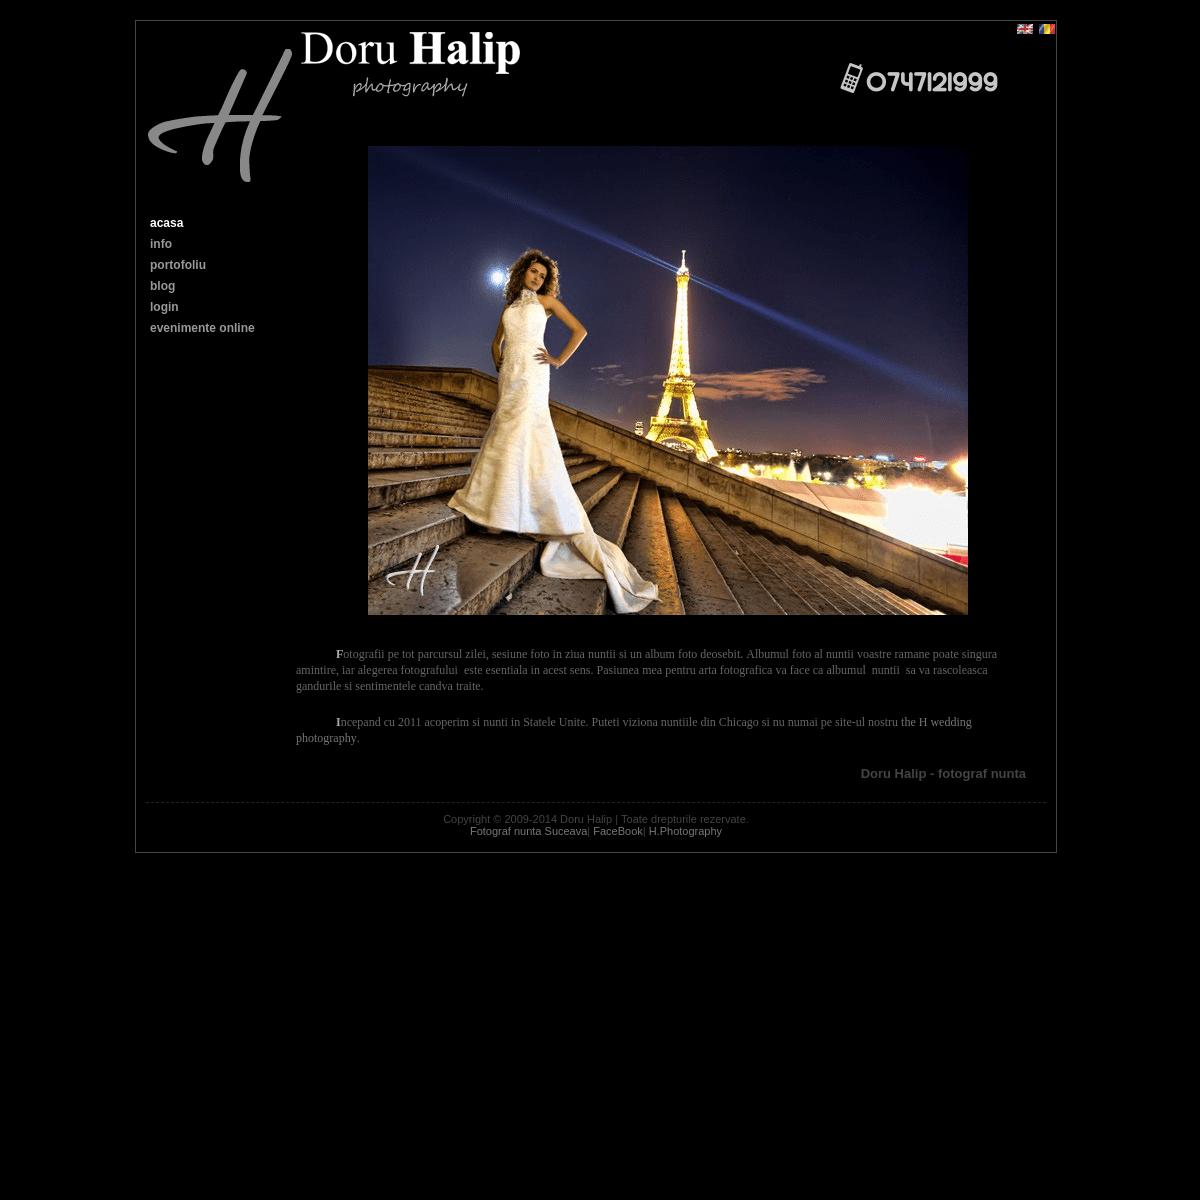 ArchiveBay.com - doruhalip.ro - Fotograf nunta - Doru Halip - Suceava,Botosani,Iasi, Bacau, Neamt,Bucuresti - Fotograf nunta Suceava- fotografii nunta